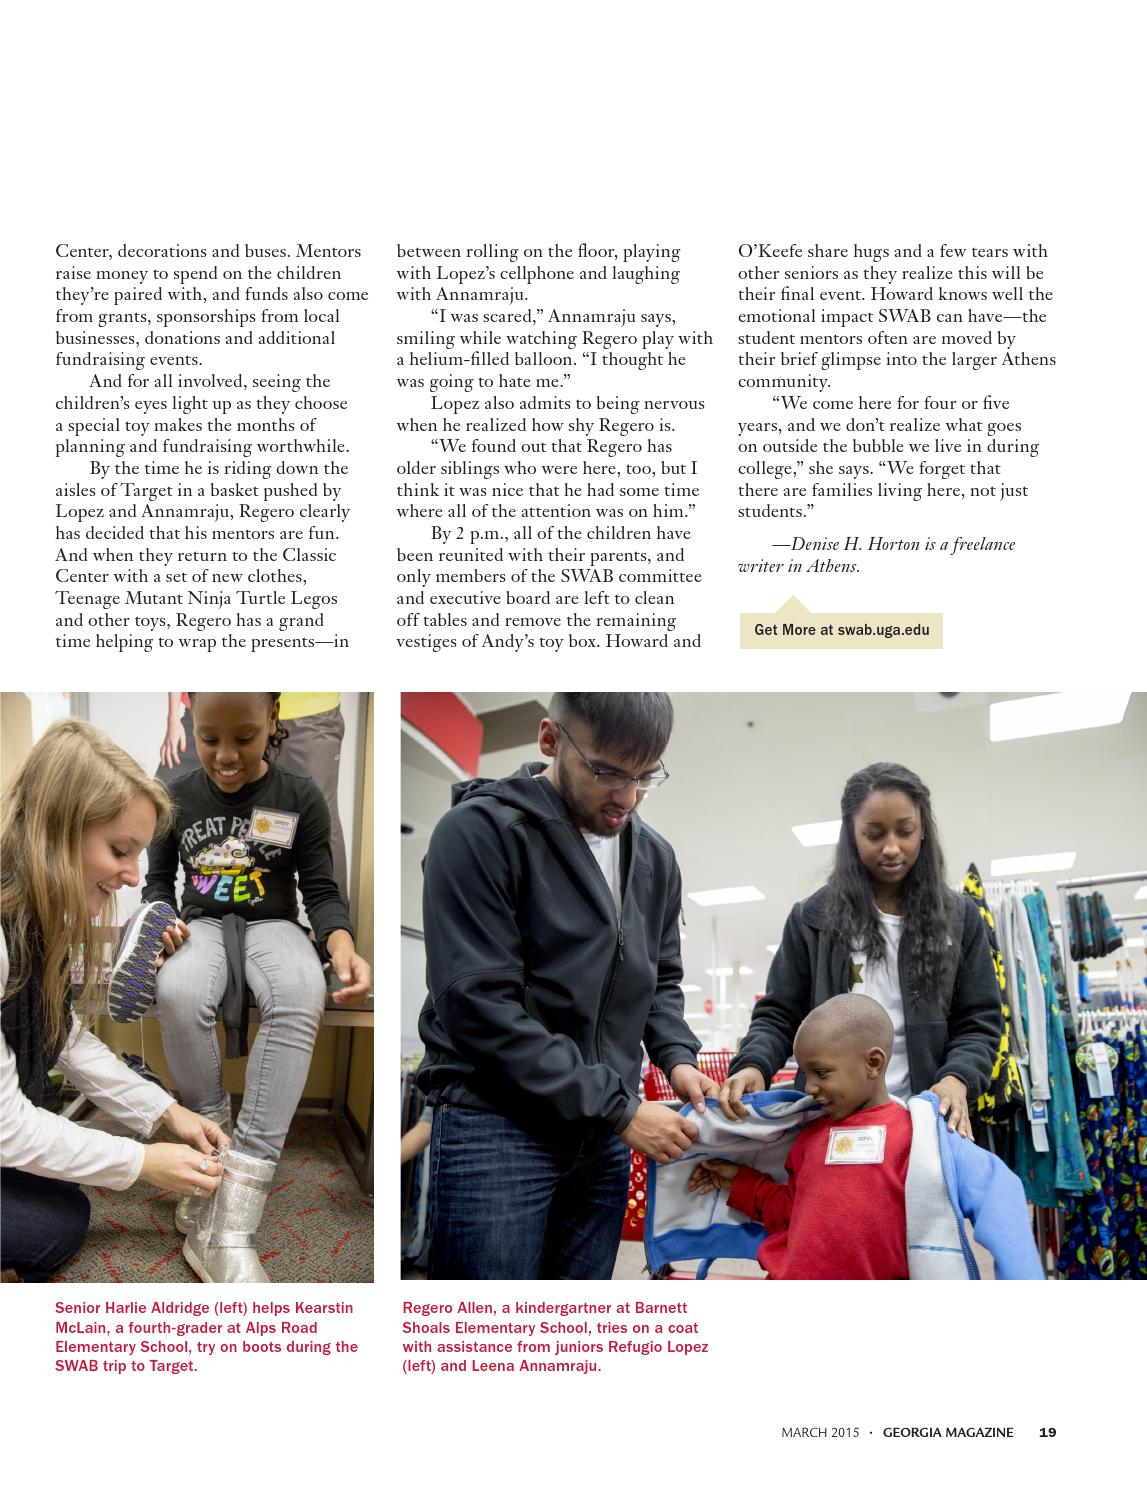 Georgia Magazine March 2015